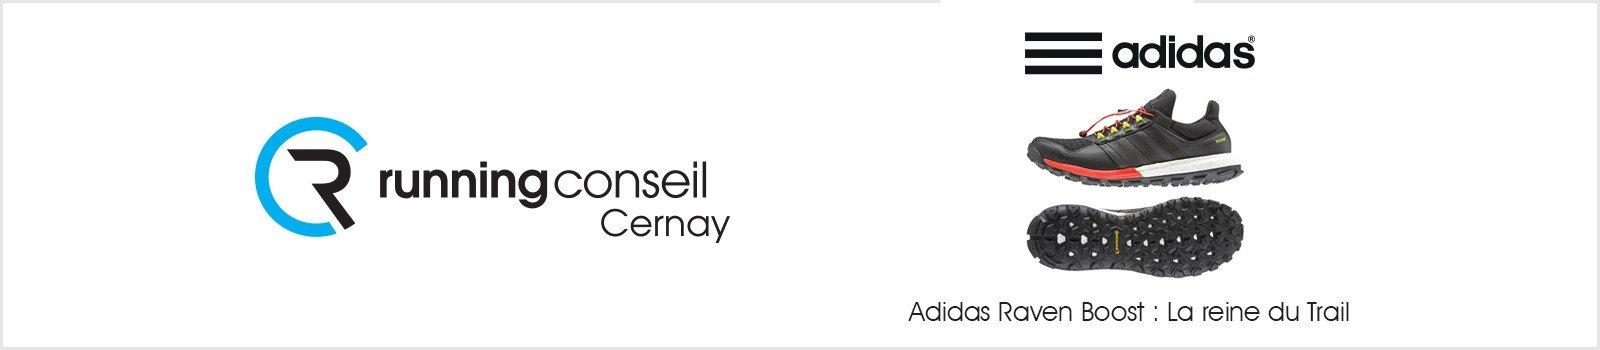 Adidas Raven Boost : La reine du Trail